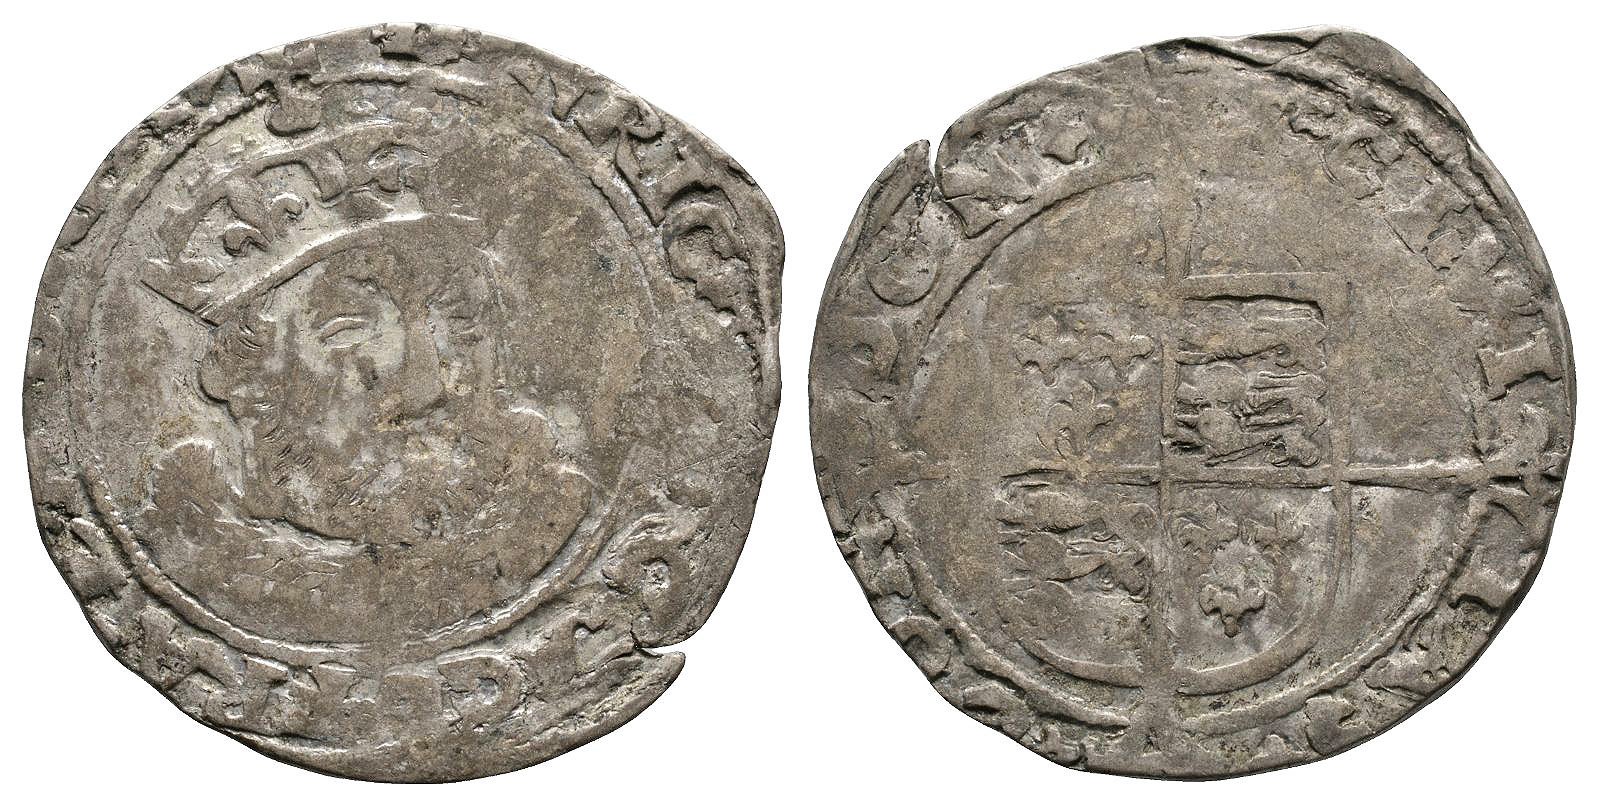 English Tudor Coins - Edward VI (in name of Henry VIII) - Southwark - Facing Bust Groat